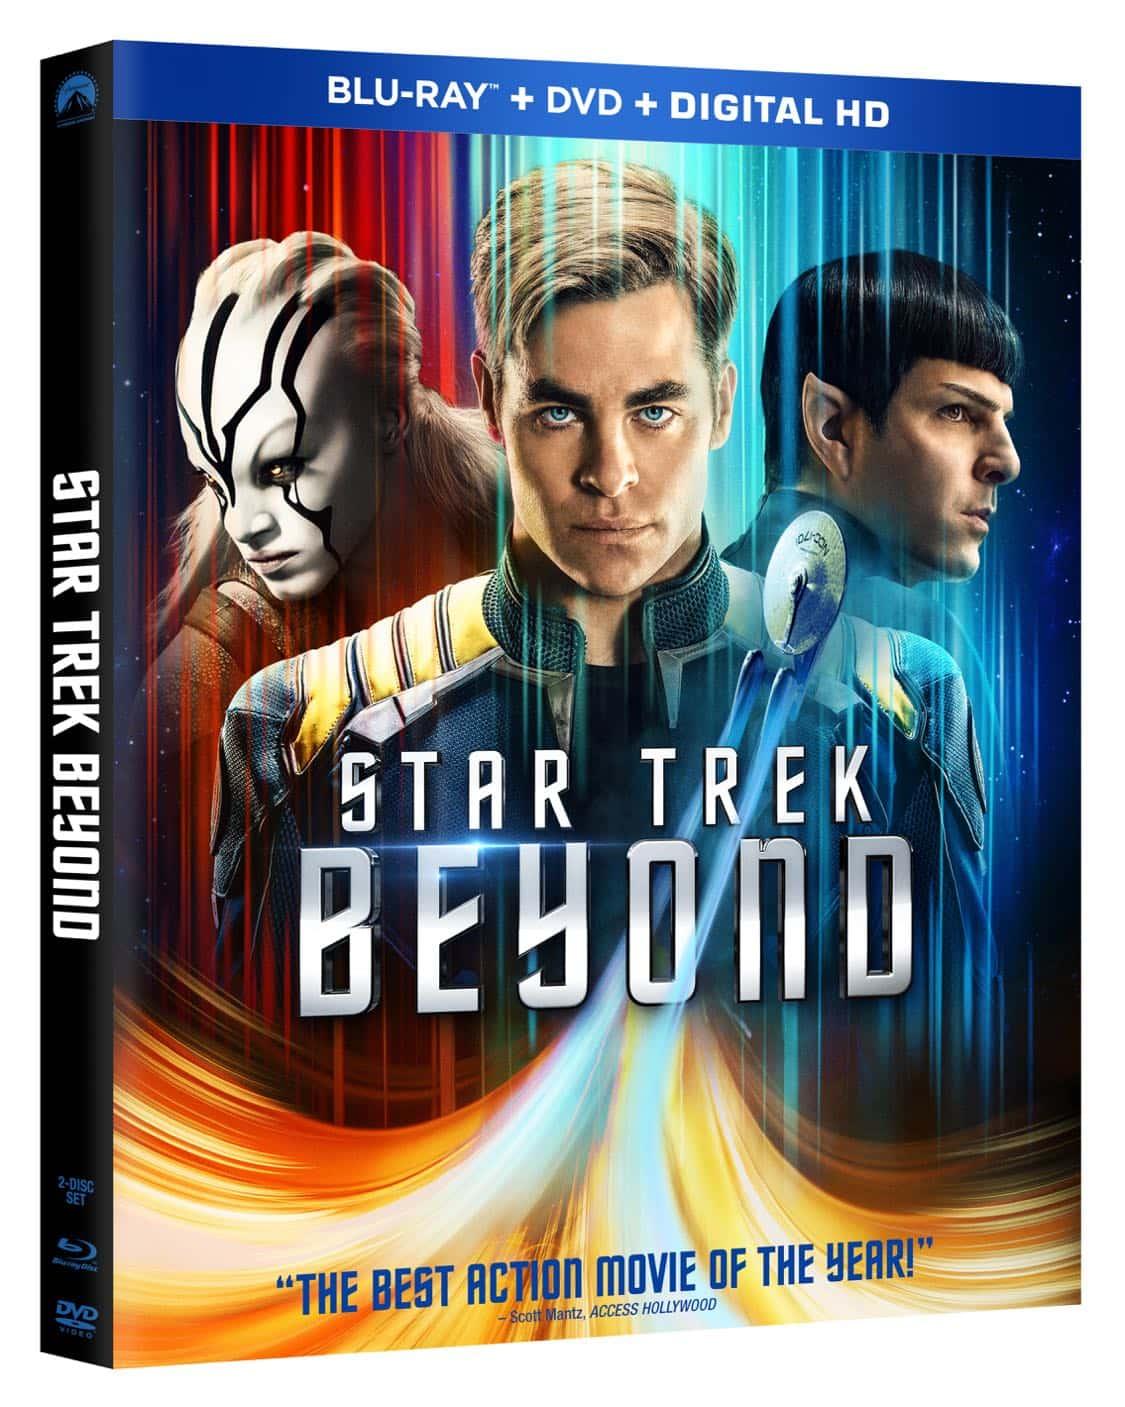 star-trek-beyond-blu-ray-and-dvd-release-details-1